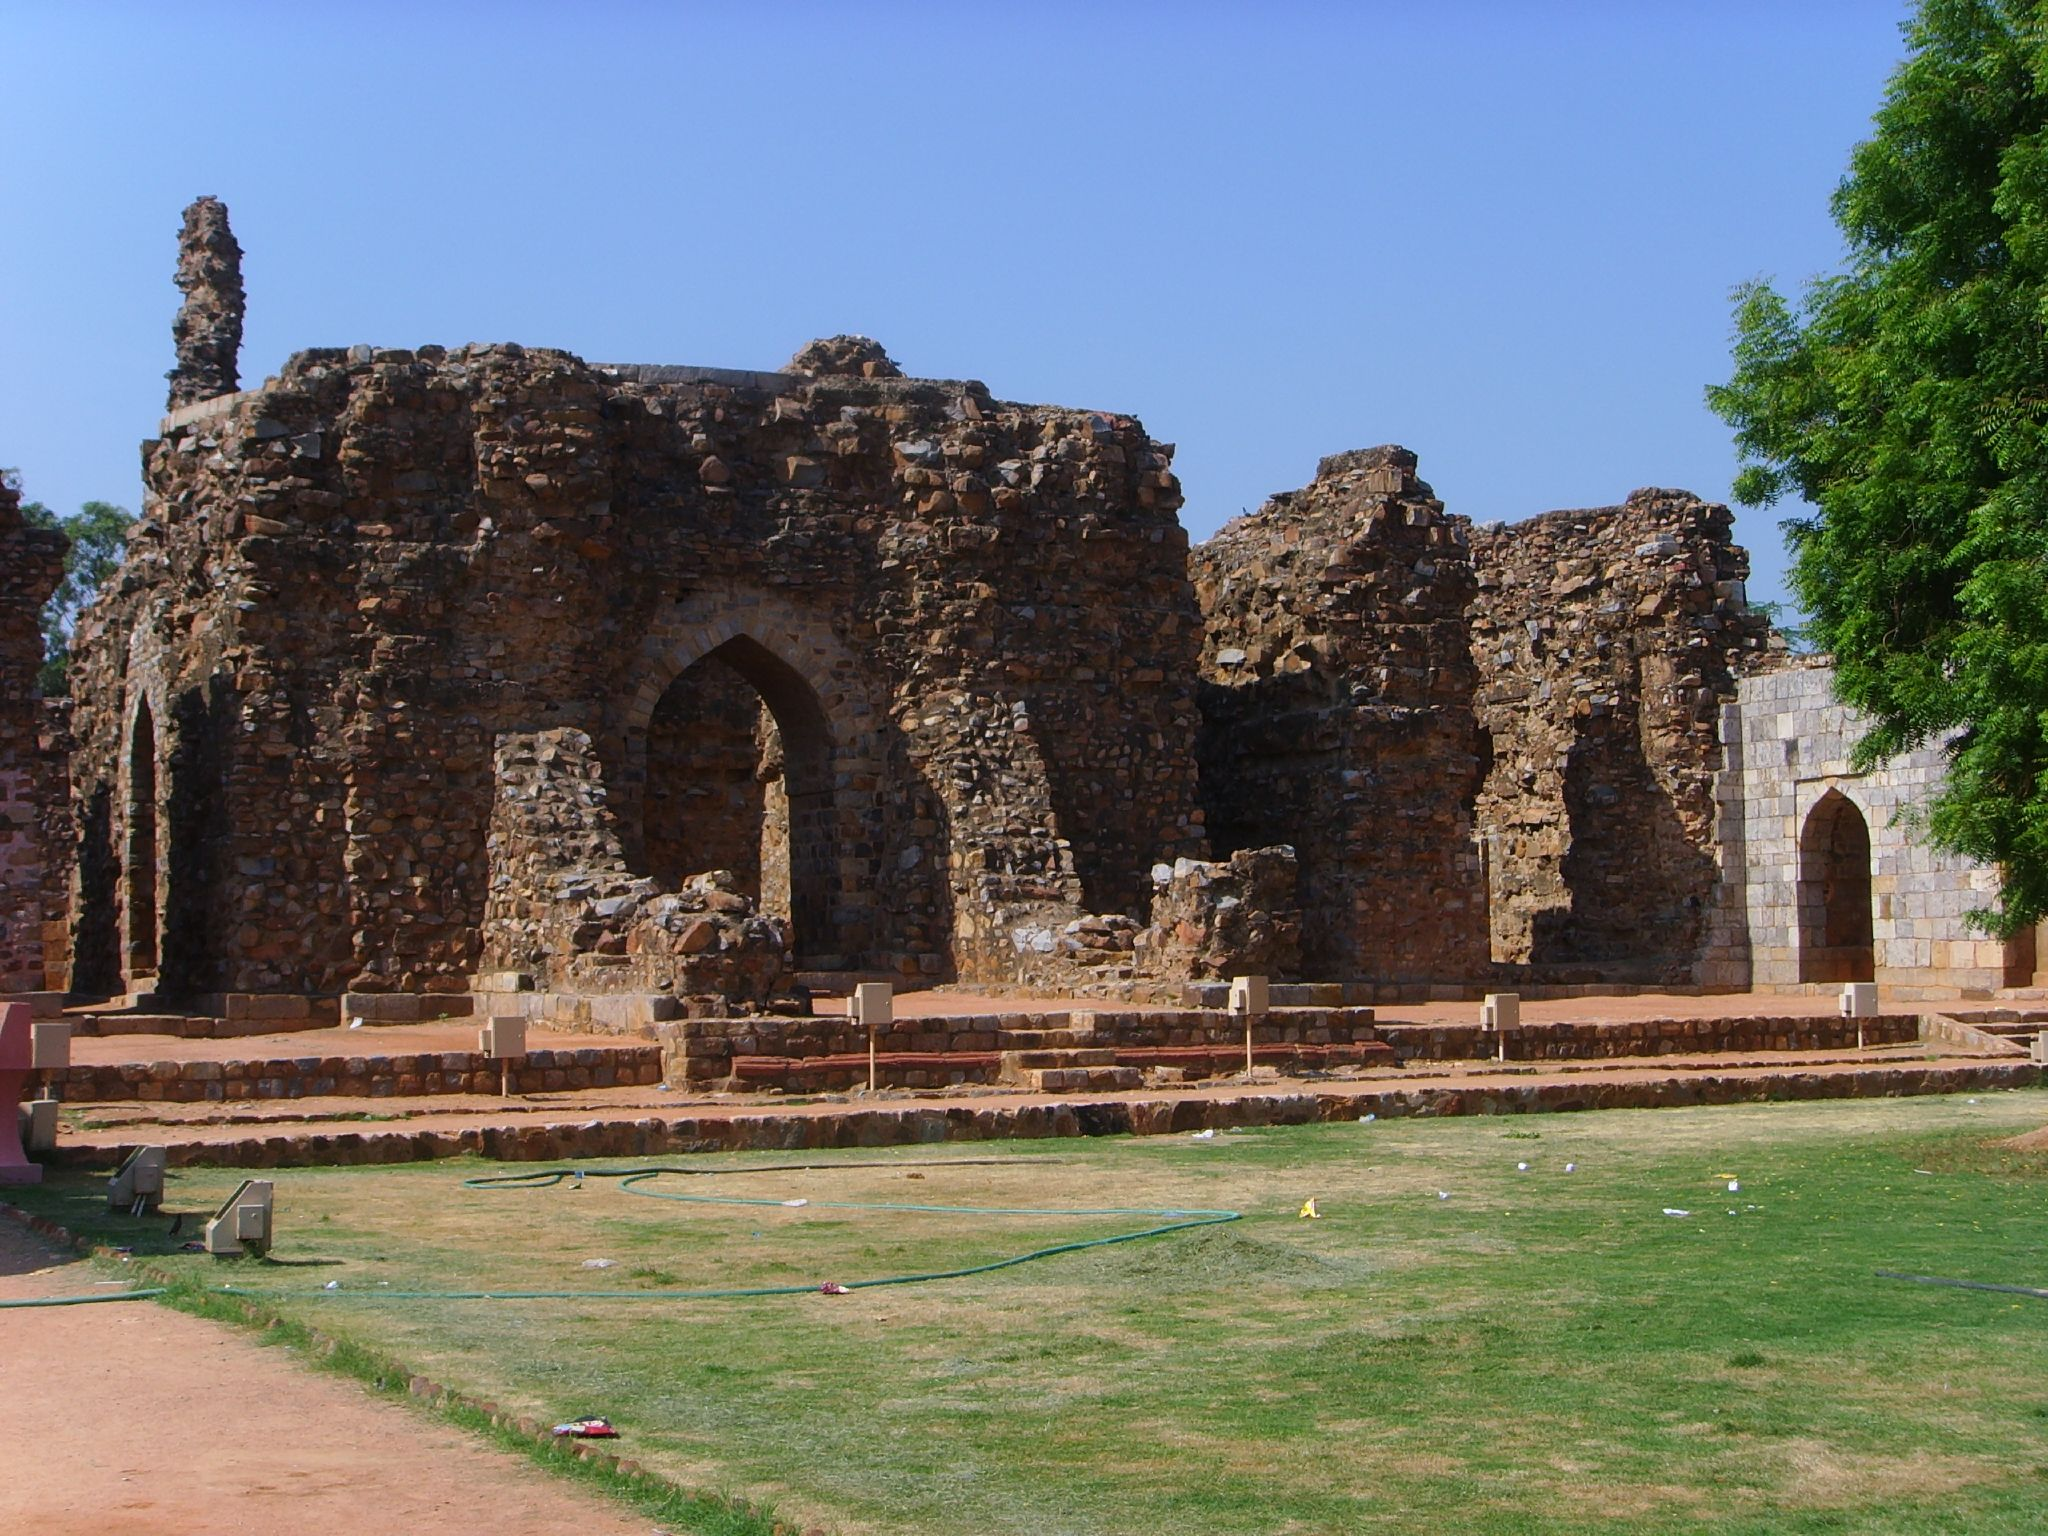 File:Tomb of Alauddin Khilji, Qutub Minar complex, Delhi.jpg - Wikimedia Commons